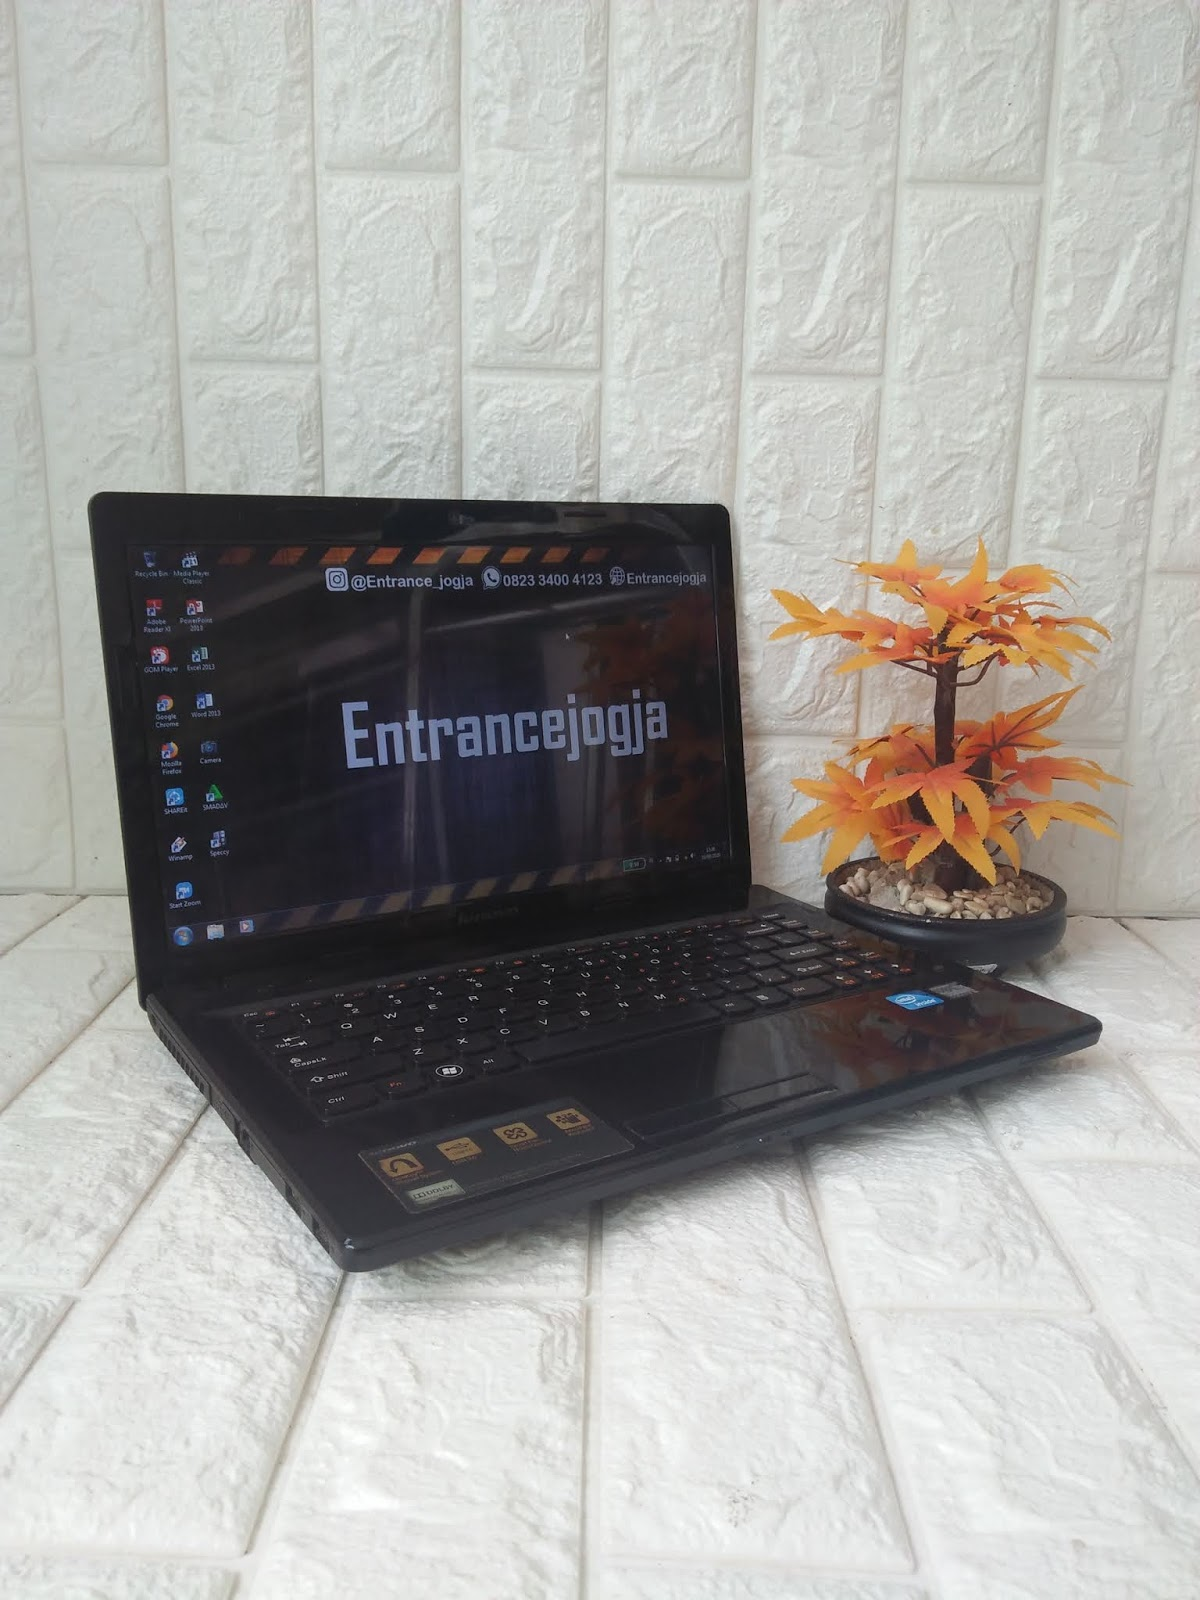 Jual Beli Laptop Yogyakarta 0823 3400 4123 Laptop Lenovo G480